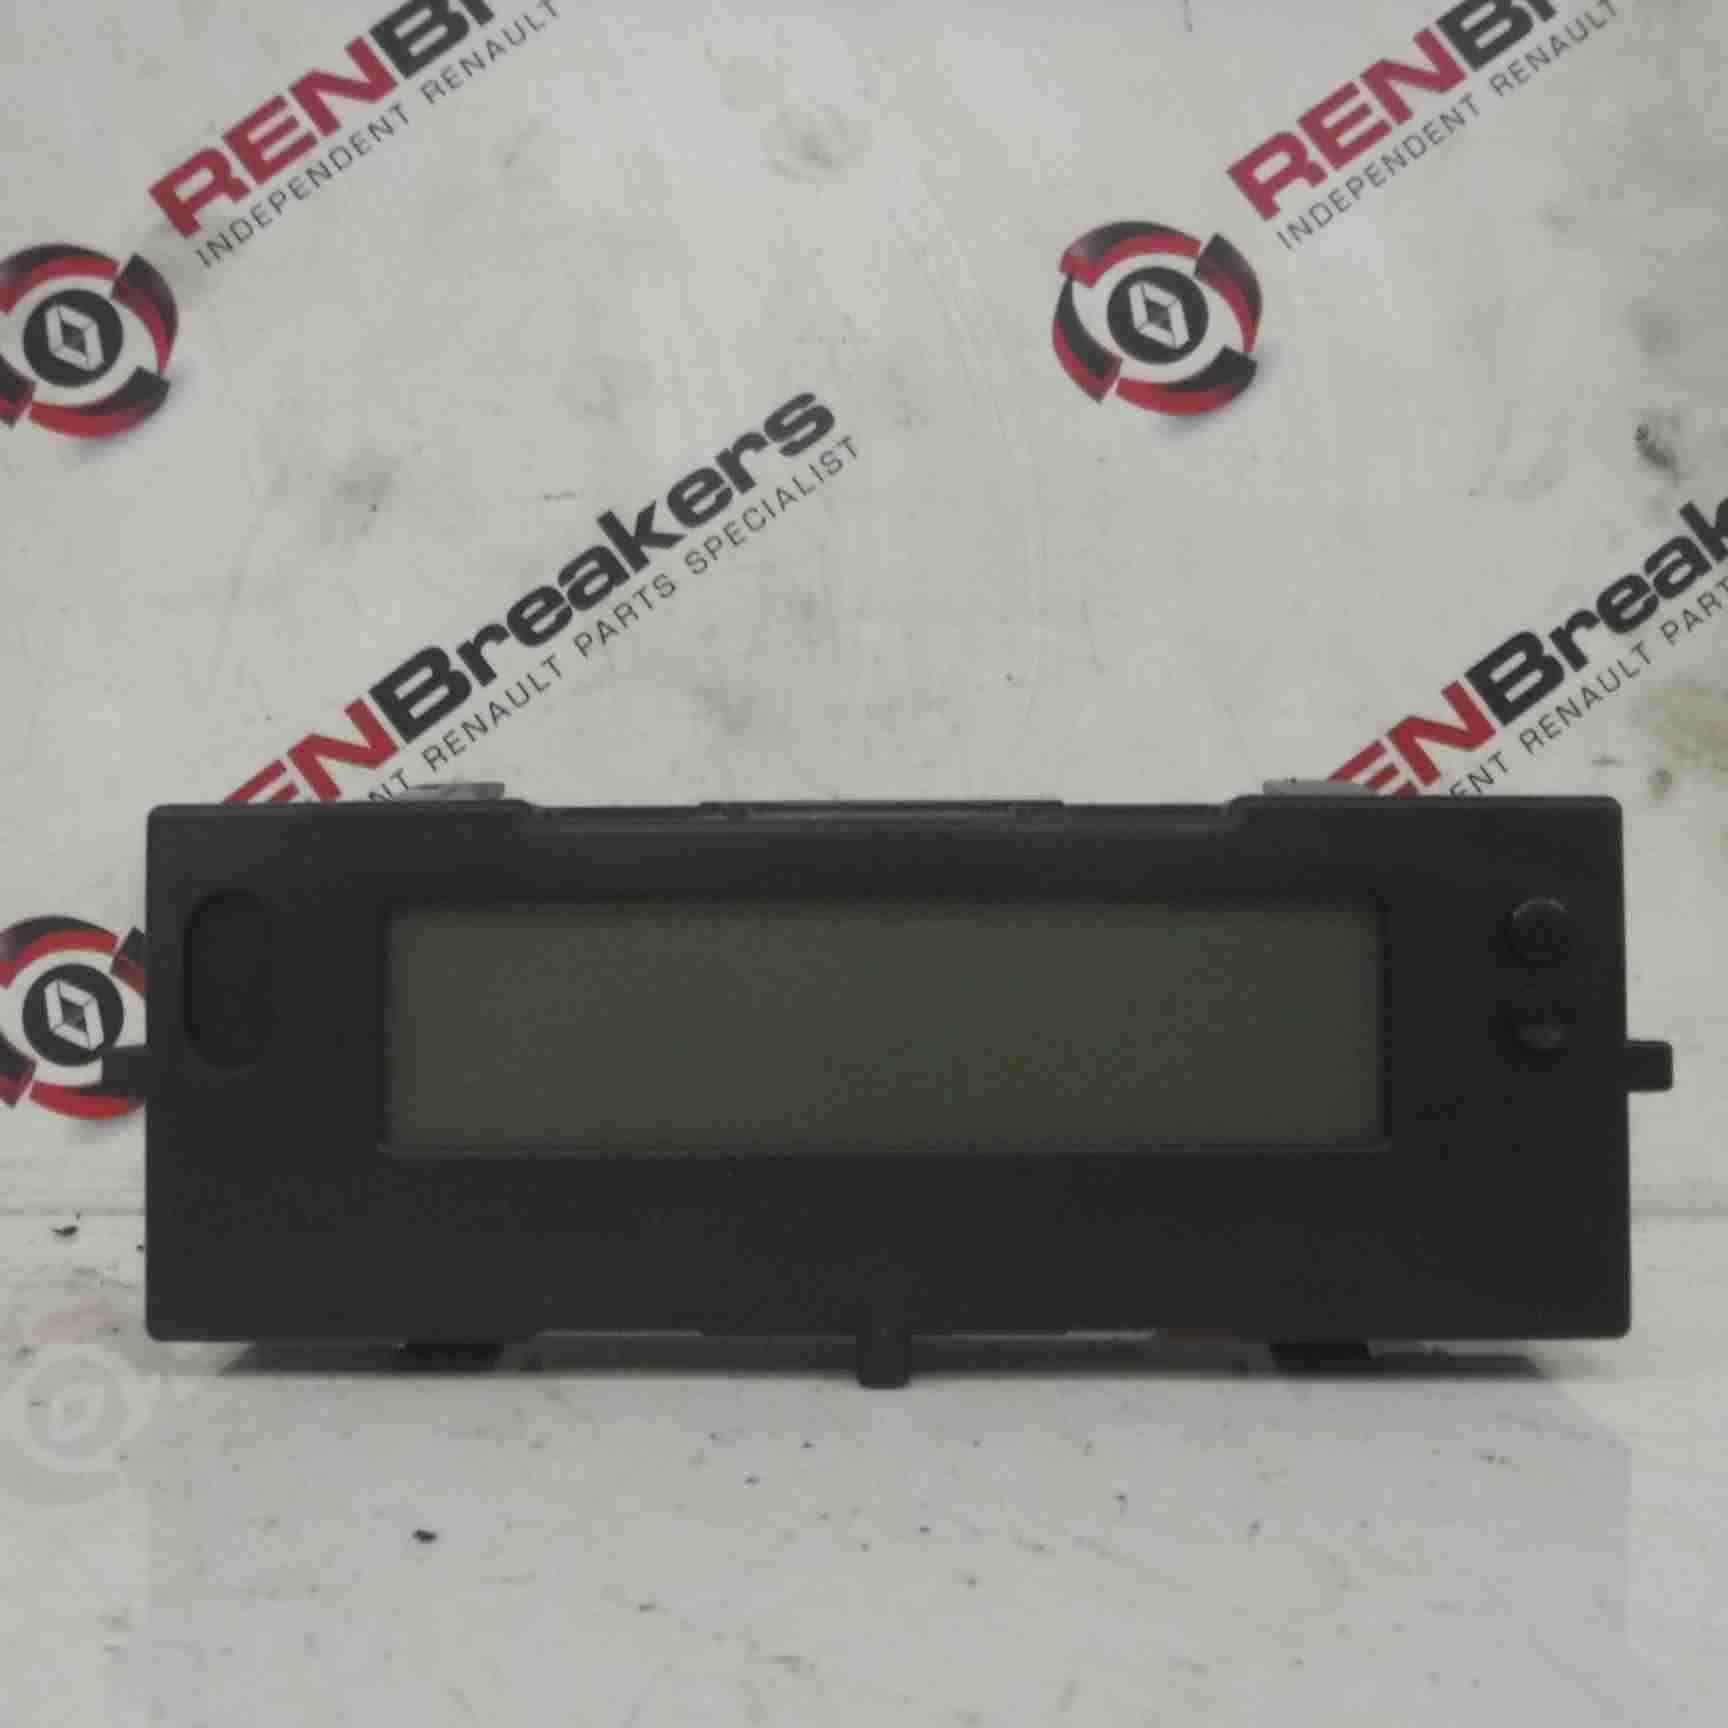 Renault Megane Sport 2002-2008 225 Radio Cd Player Display Centre Clock